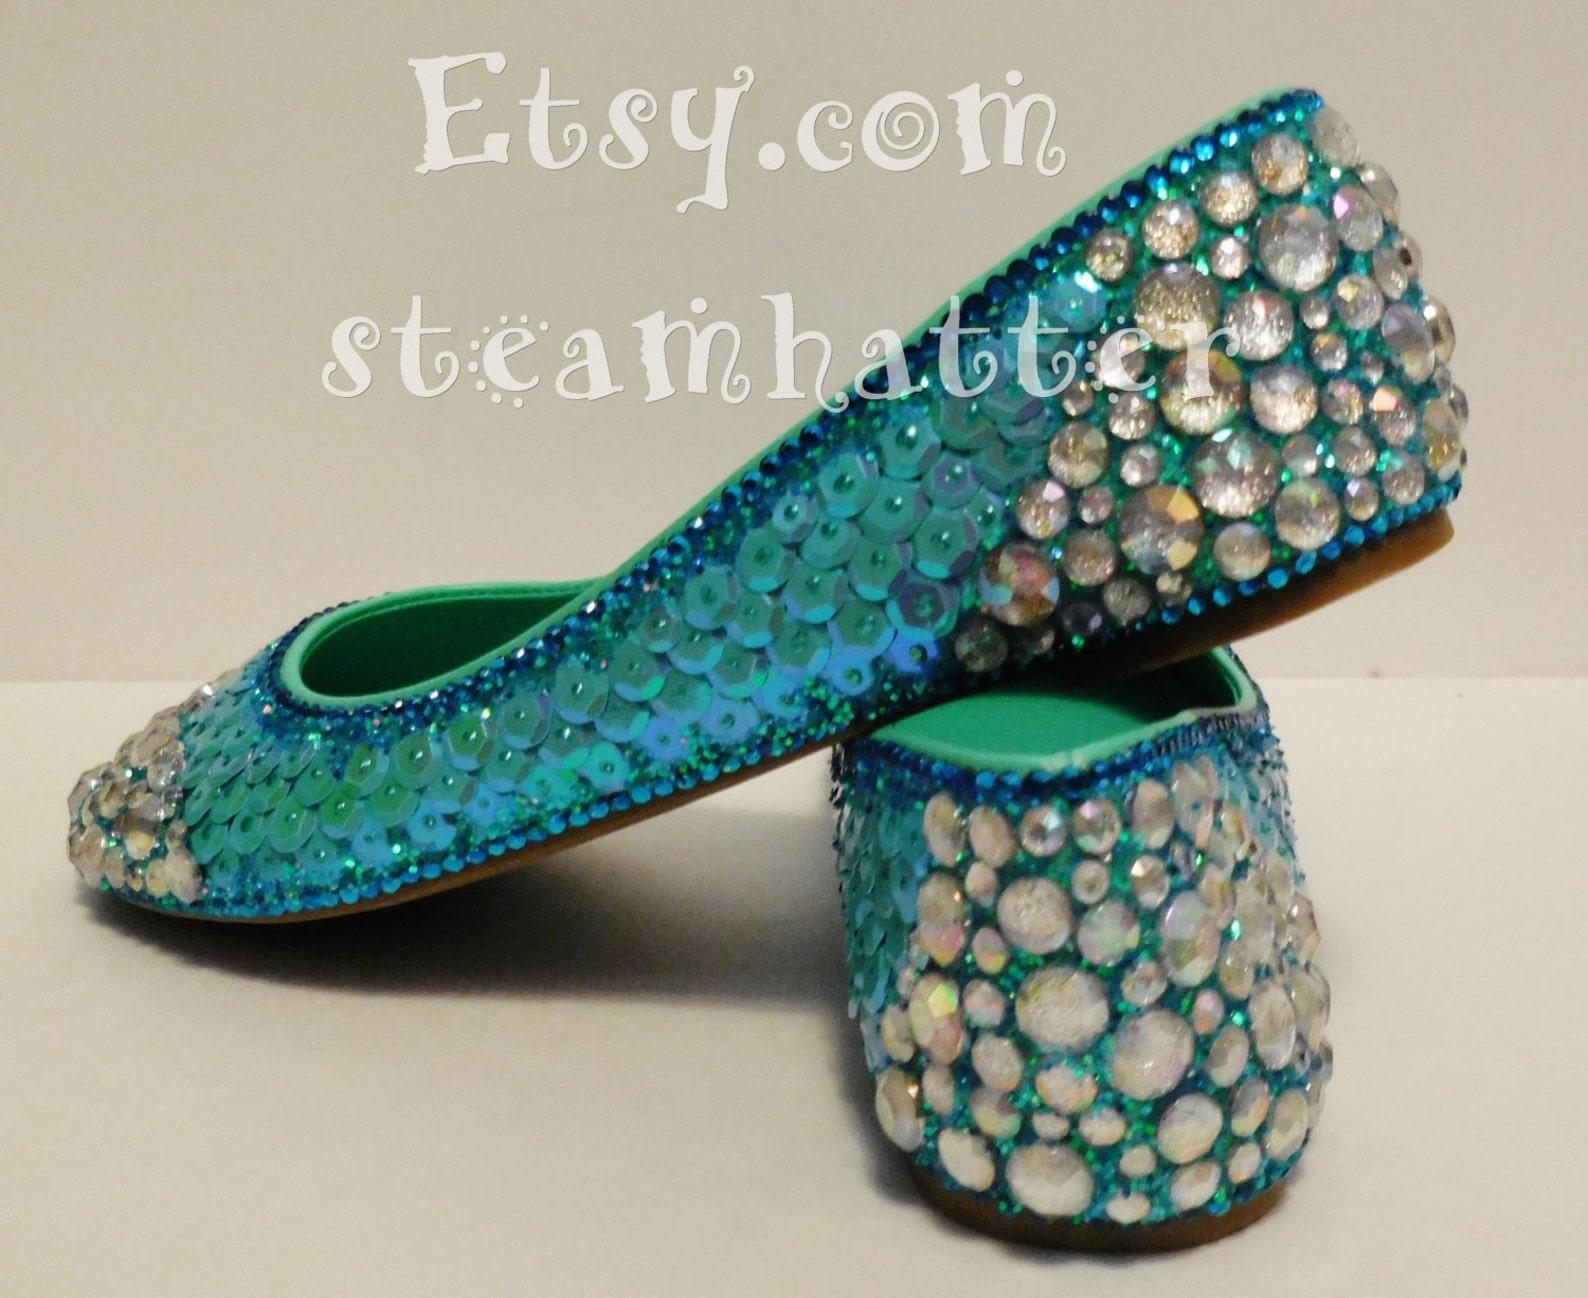 mermaid/ mermaid shoes/fish scale shoes/ mermaid flats/ custom ballet flats/ flats with scales/ glitter shoes/bling flats/custom